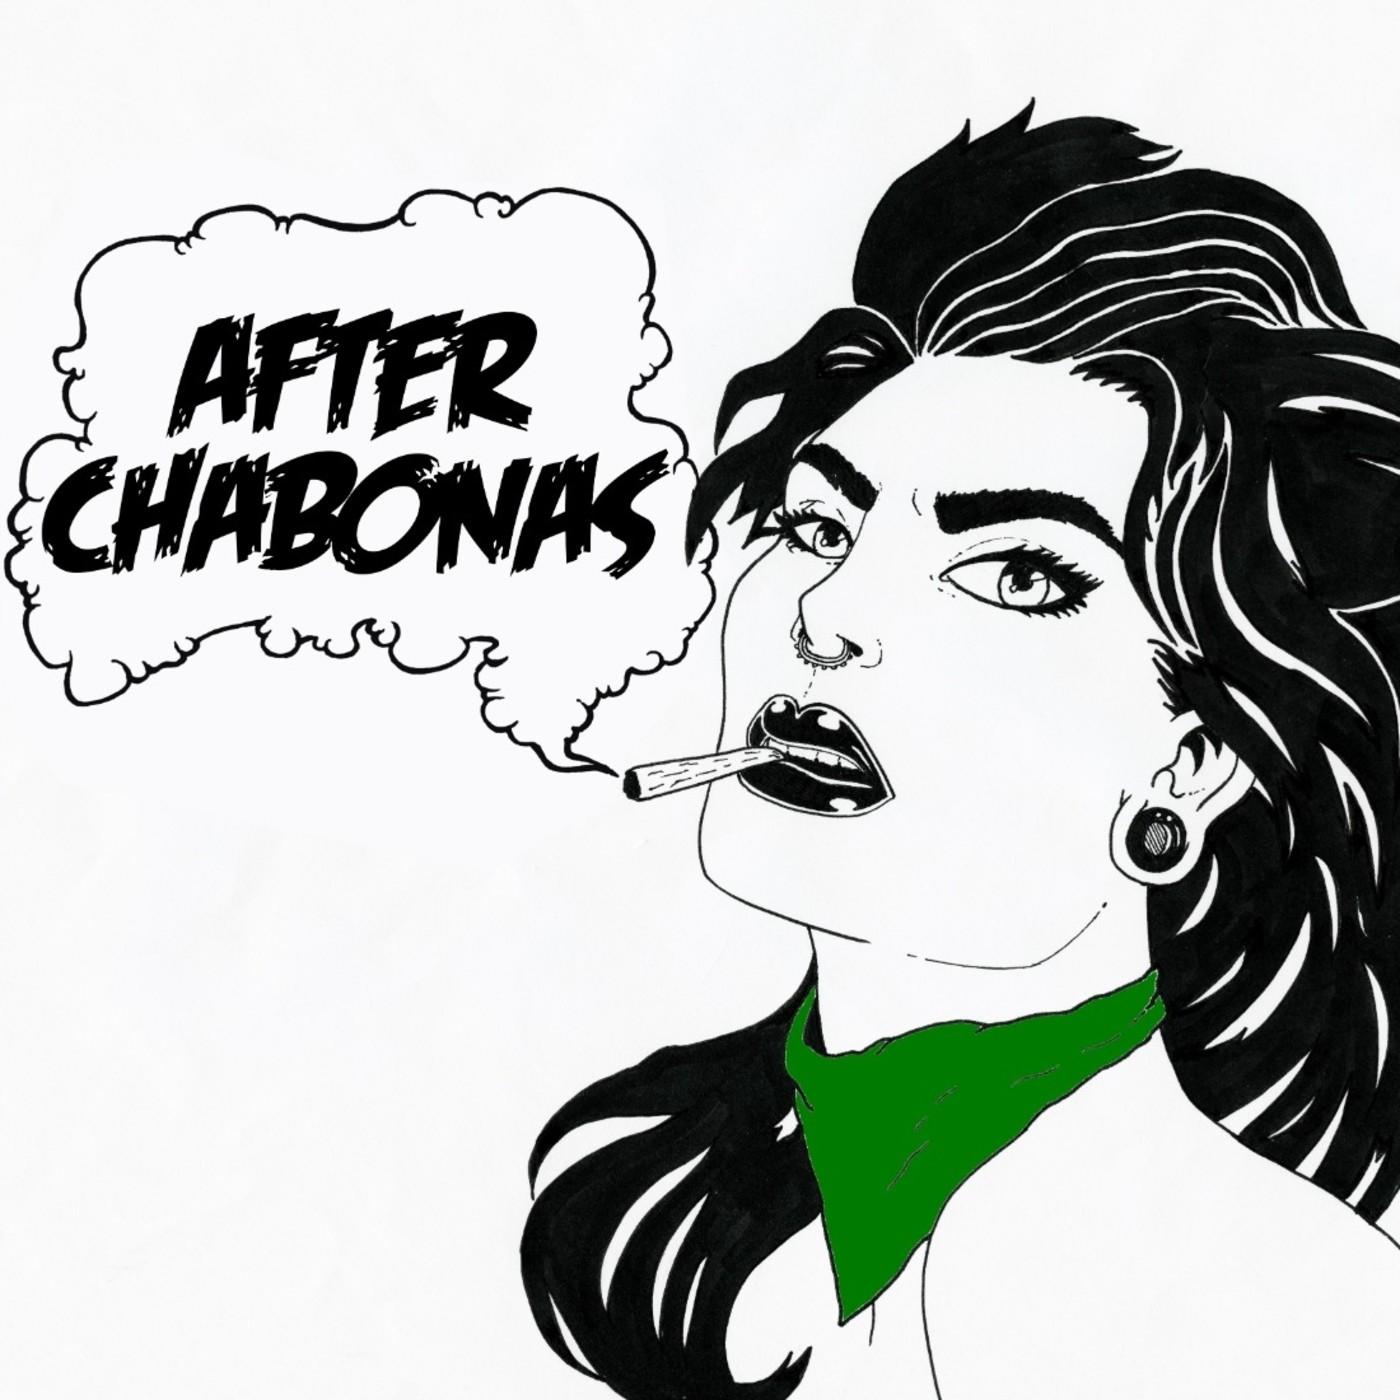 After Chabonas